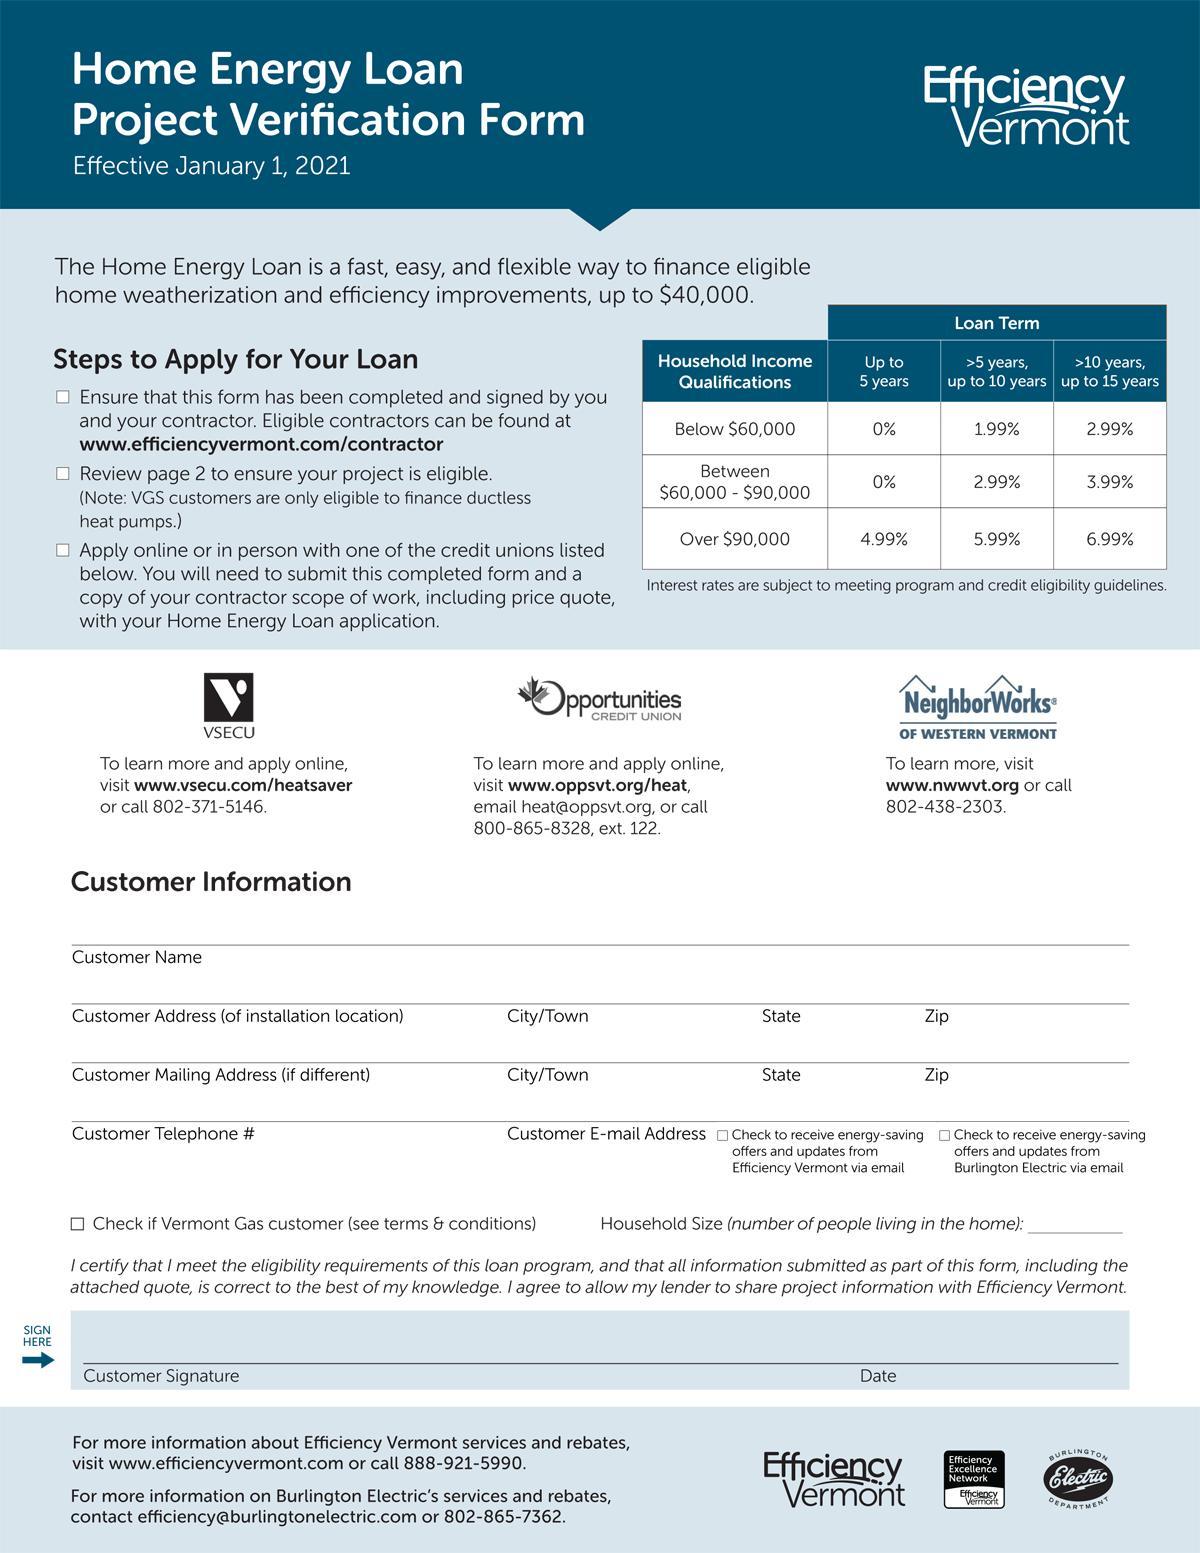 Efficiency Vermont Loan Verification